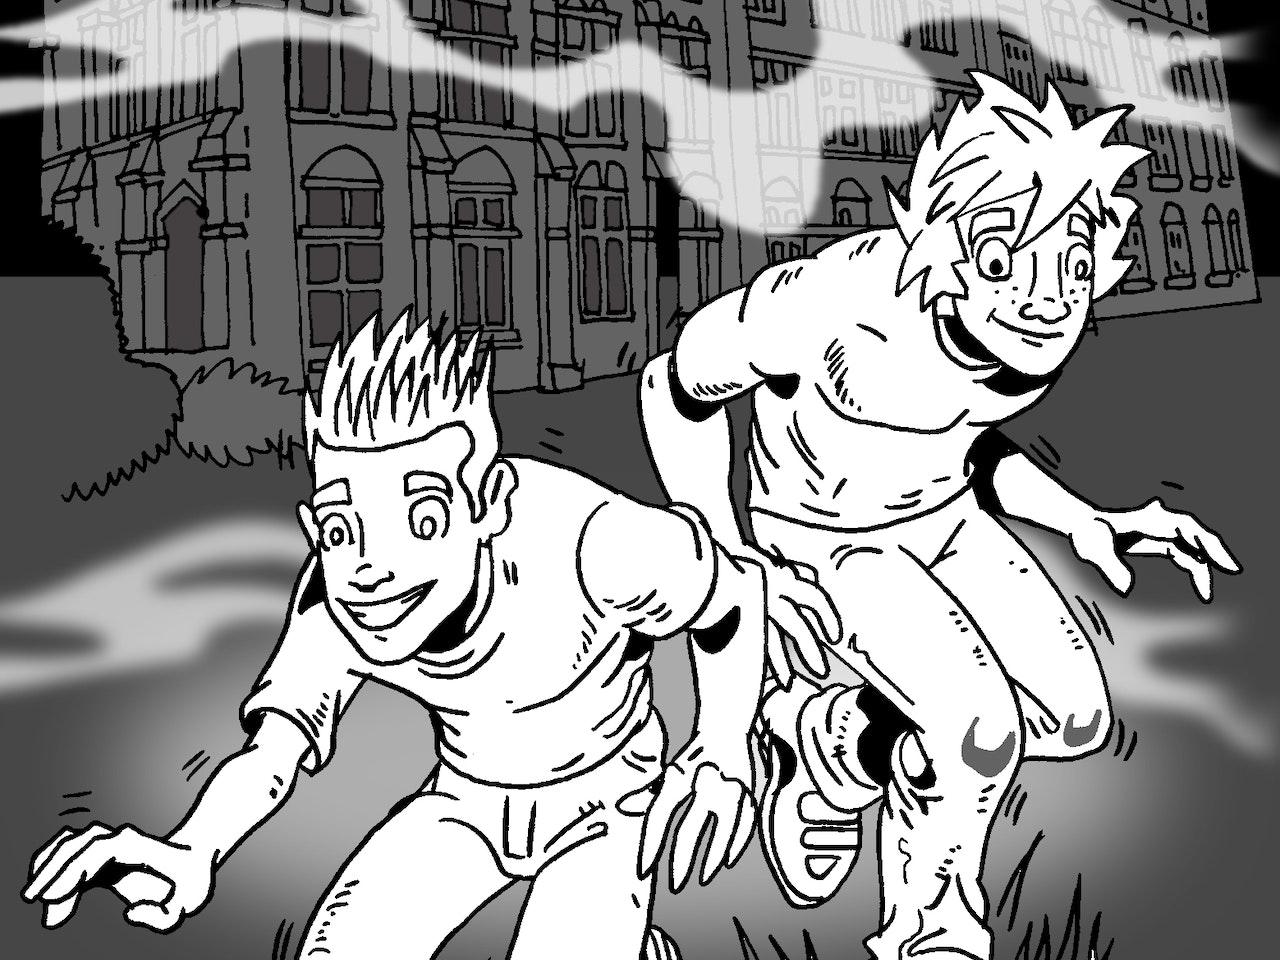 spooky horror manor manga anime childrens cartoon comic strip Book cover illustration animation